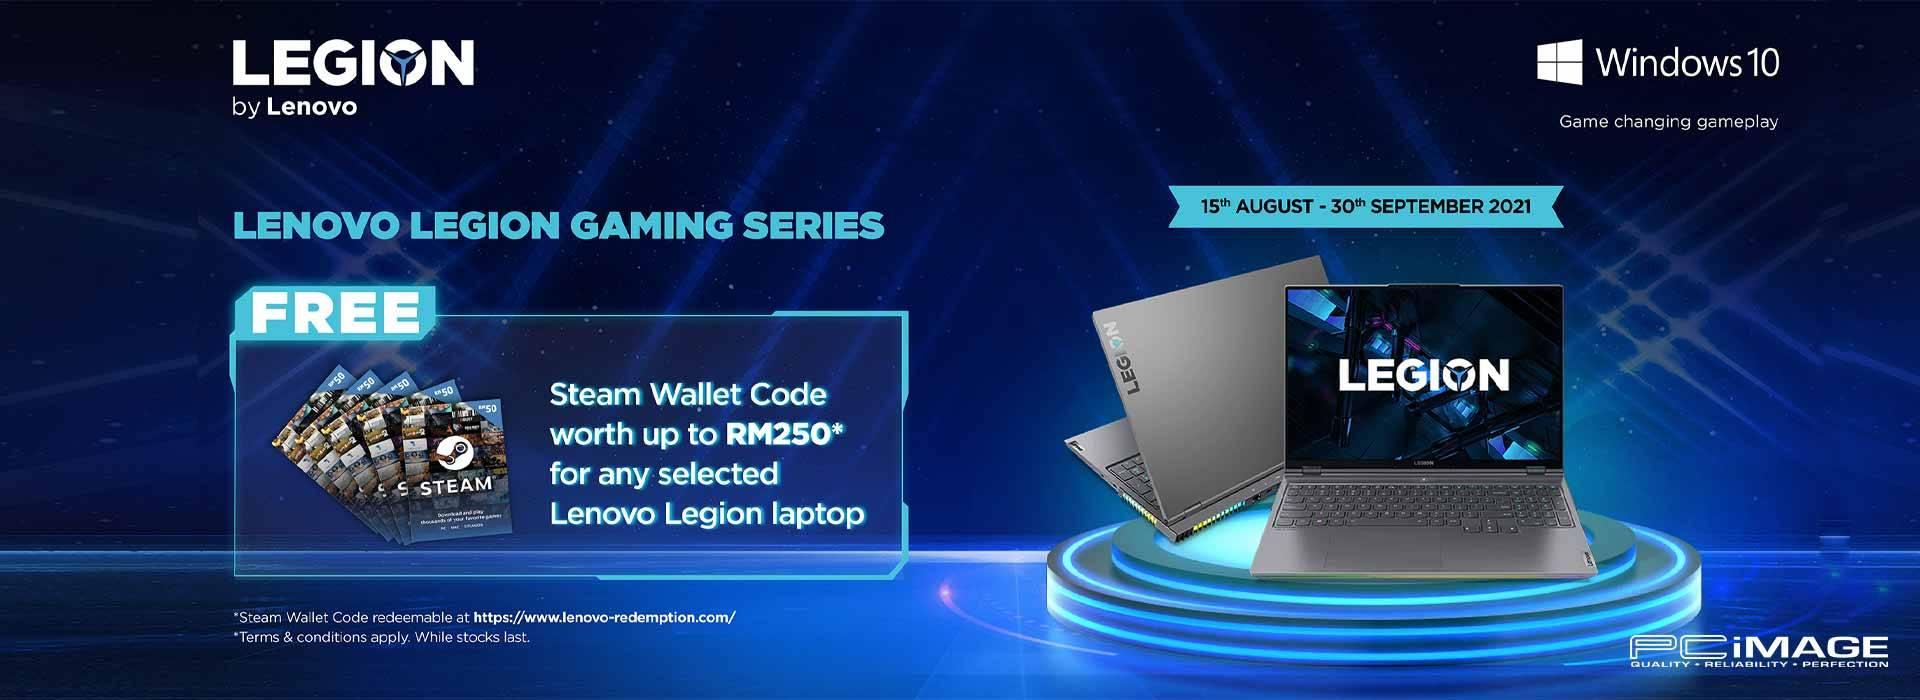 Lenovo Legion Gaming Promo 30 Sept